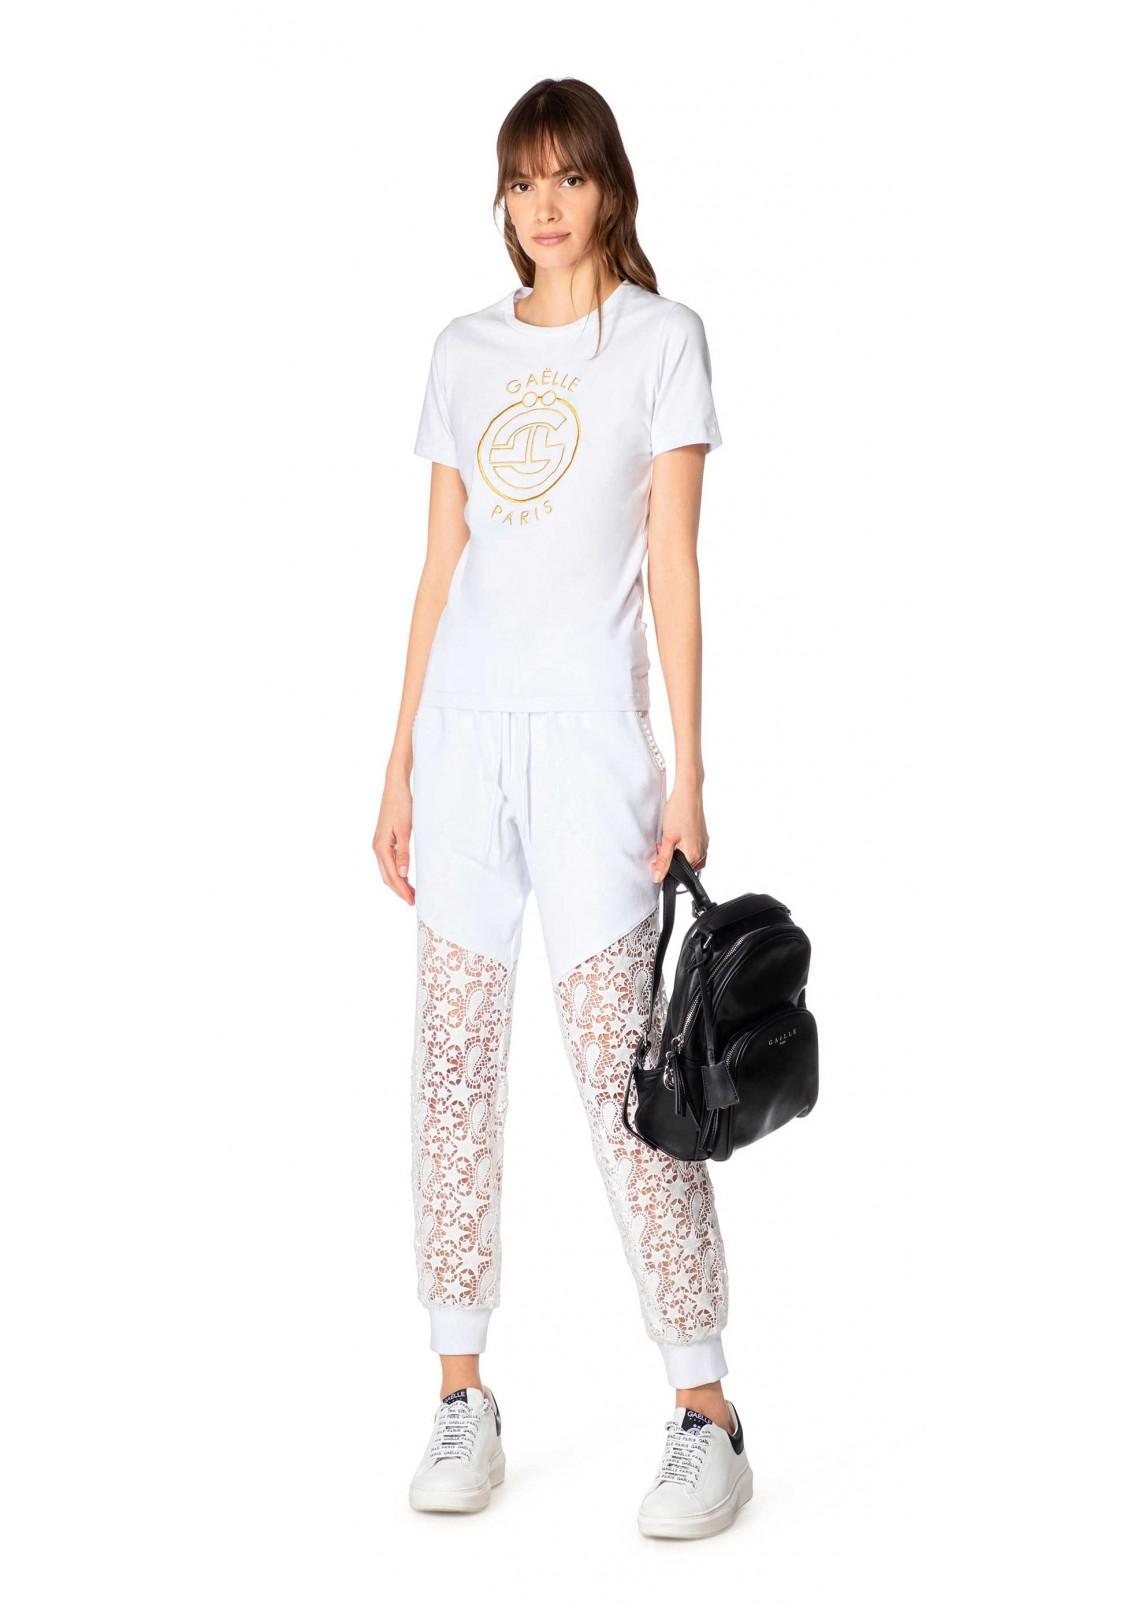 T-shirt in bielastico donna Gaelle